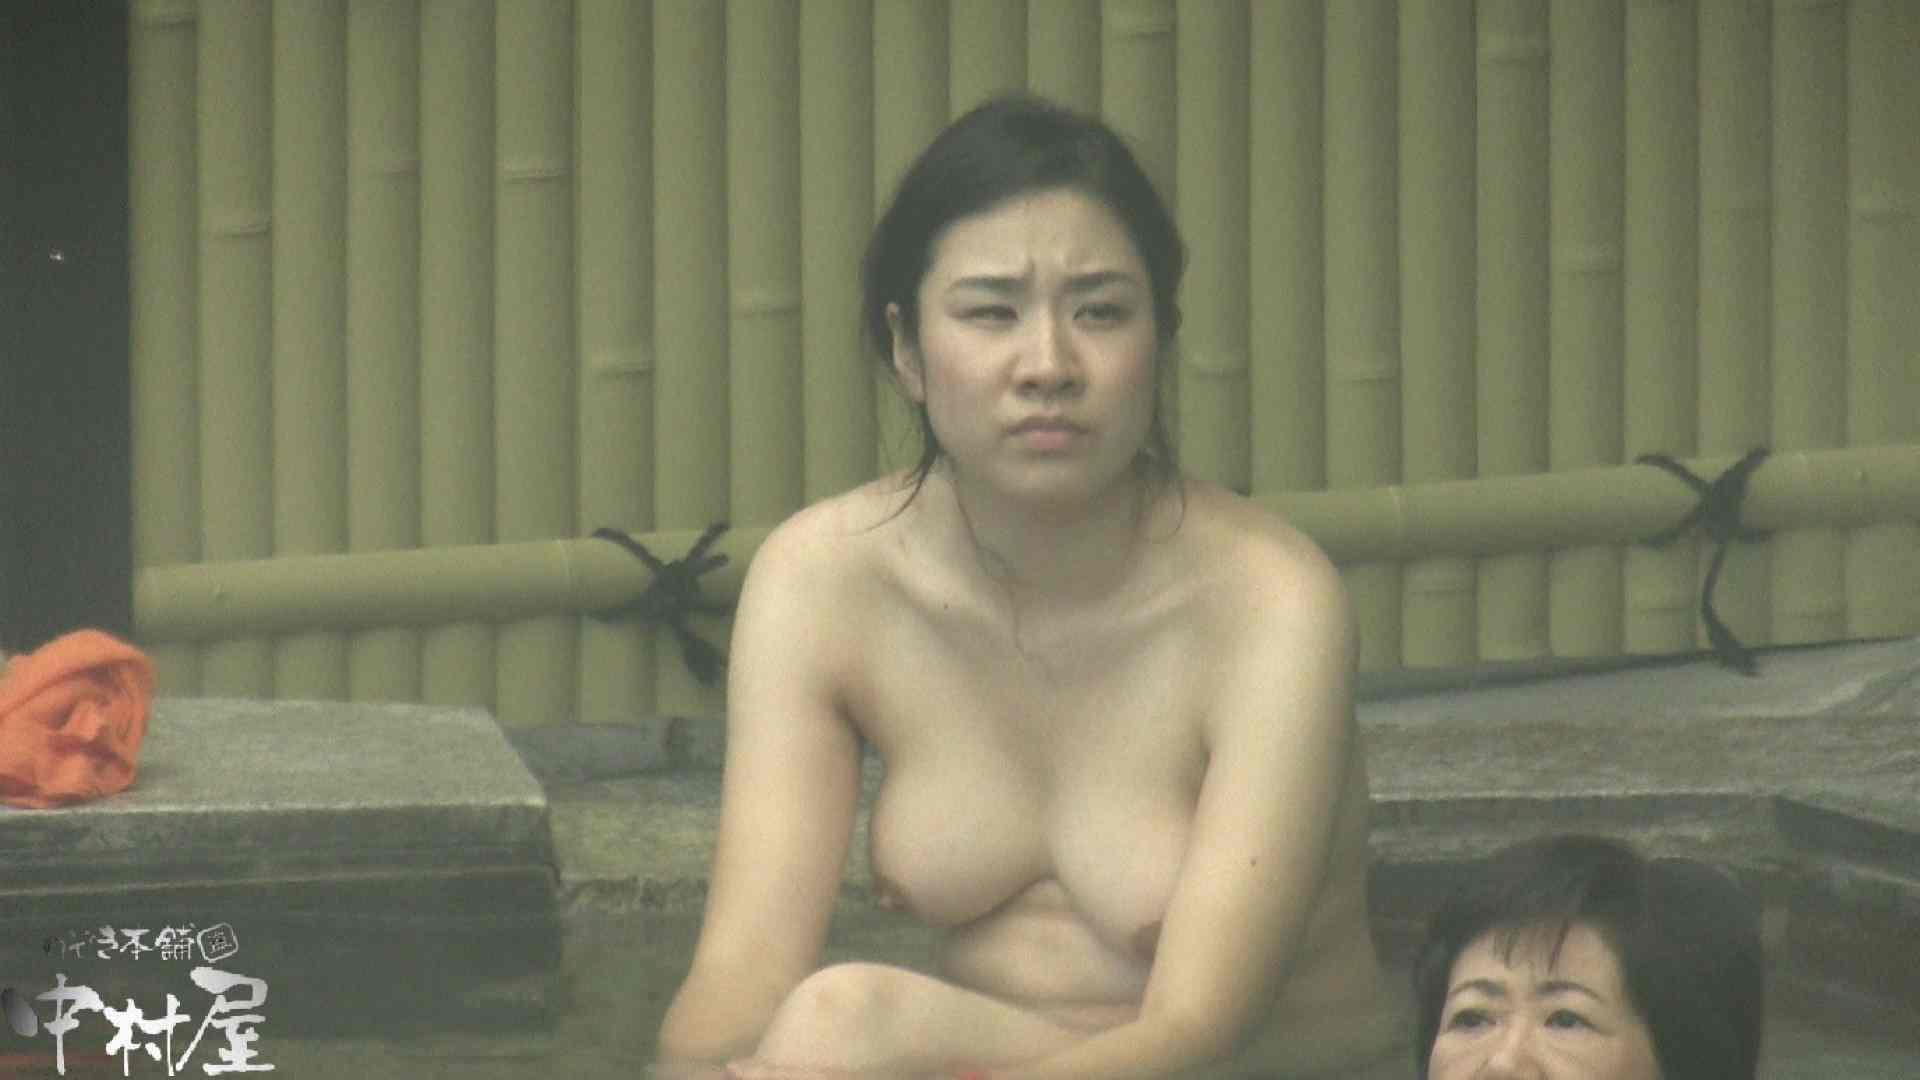 Aquaな露天風呂Vol.913 0  65連発 30